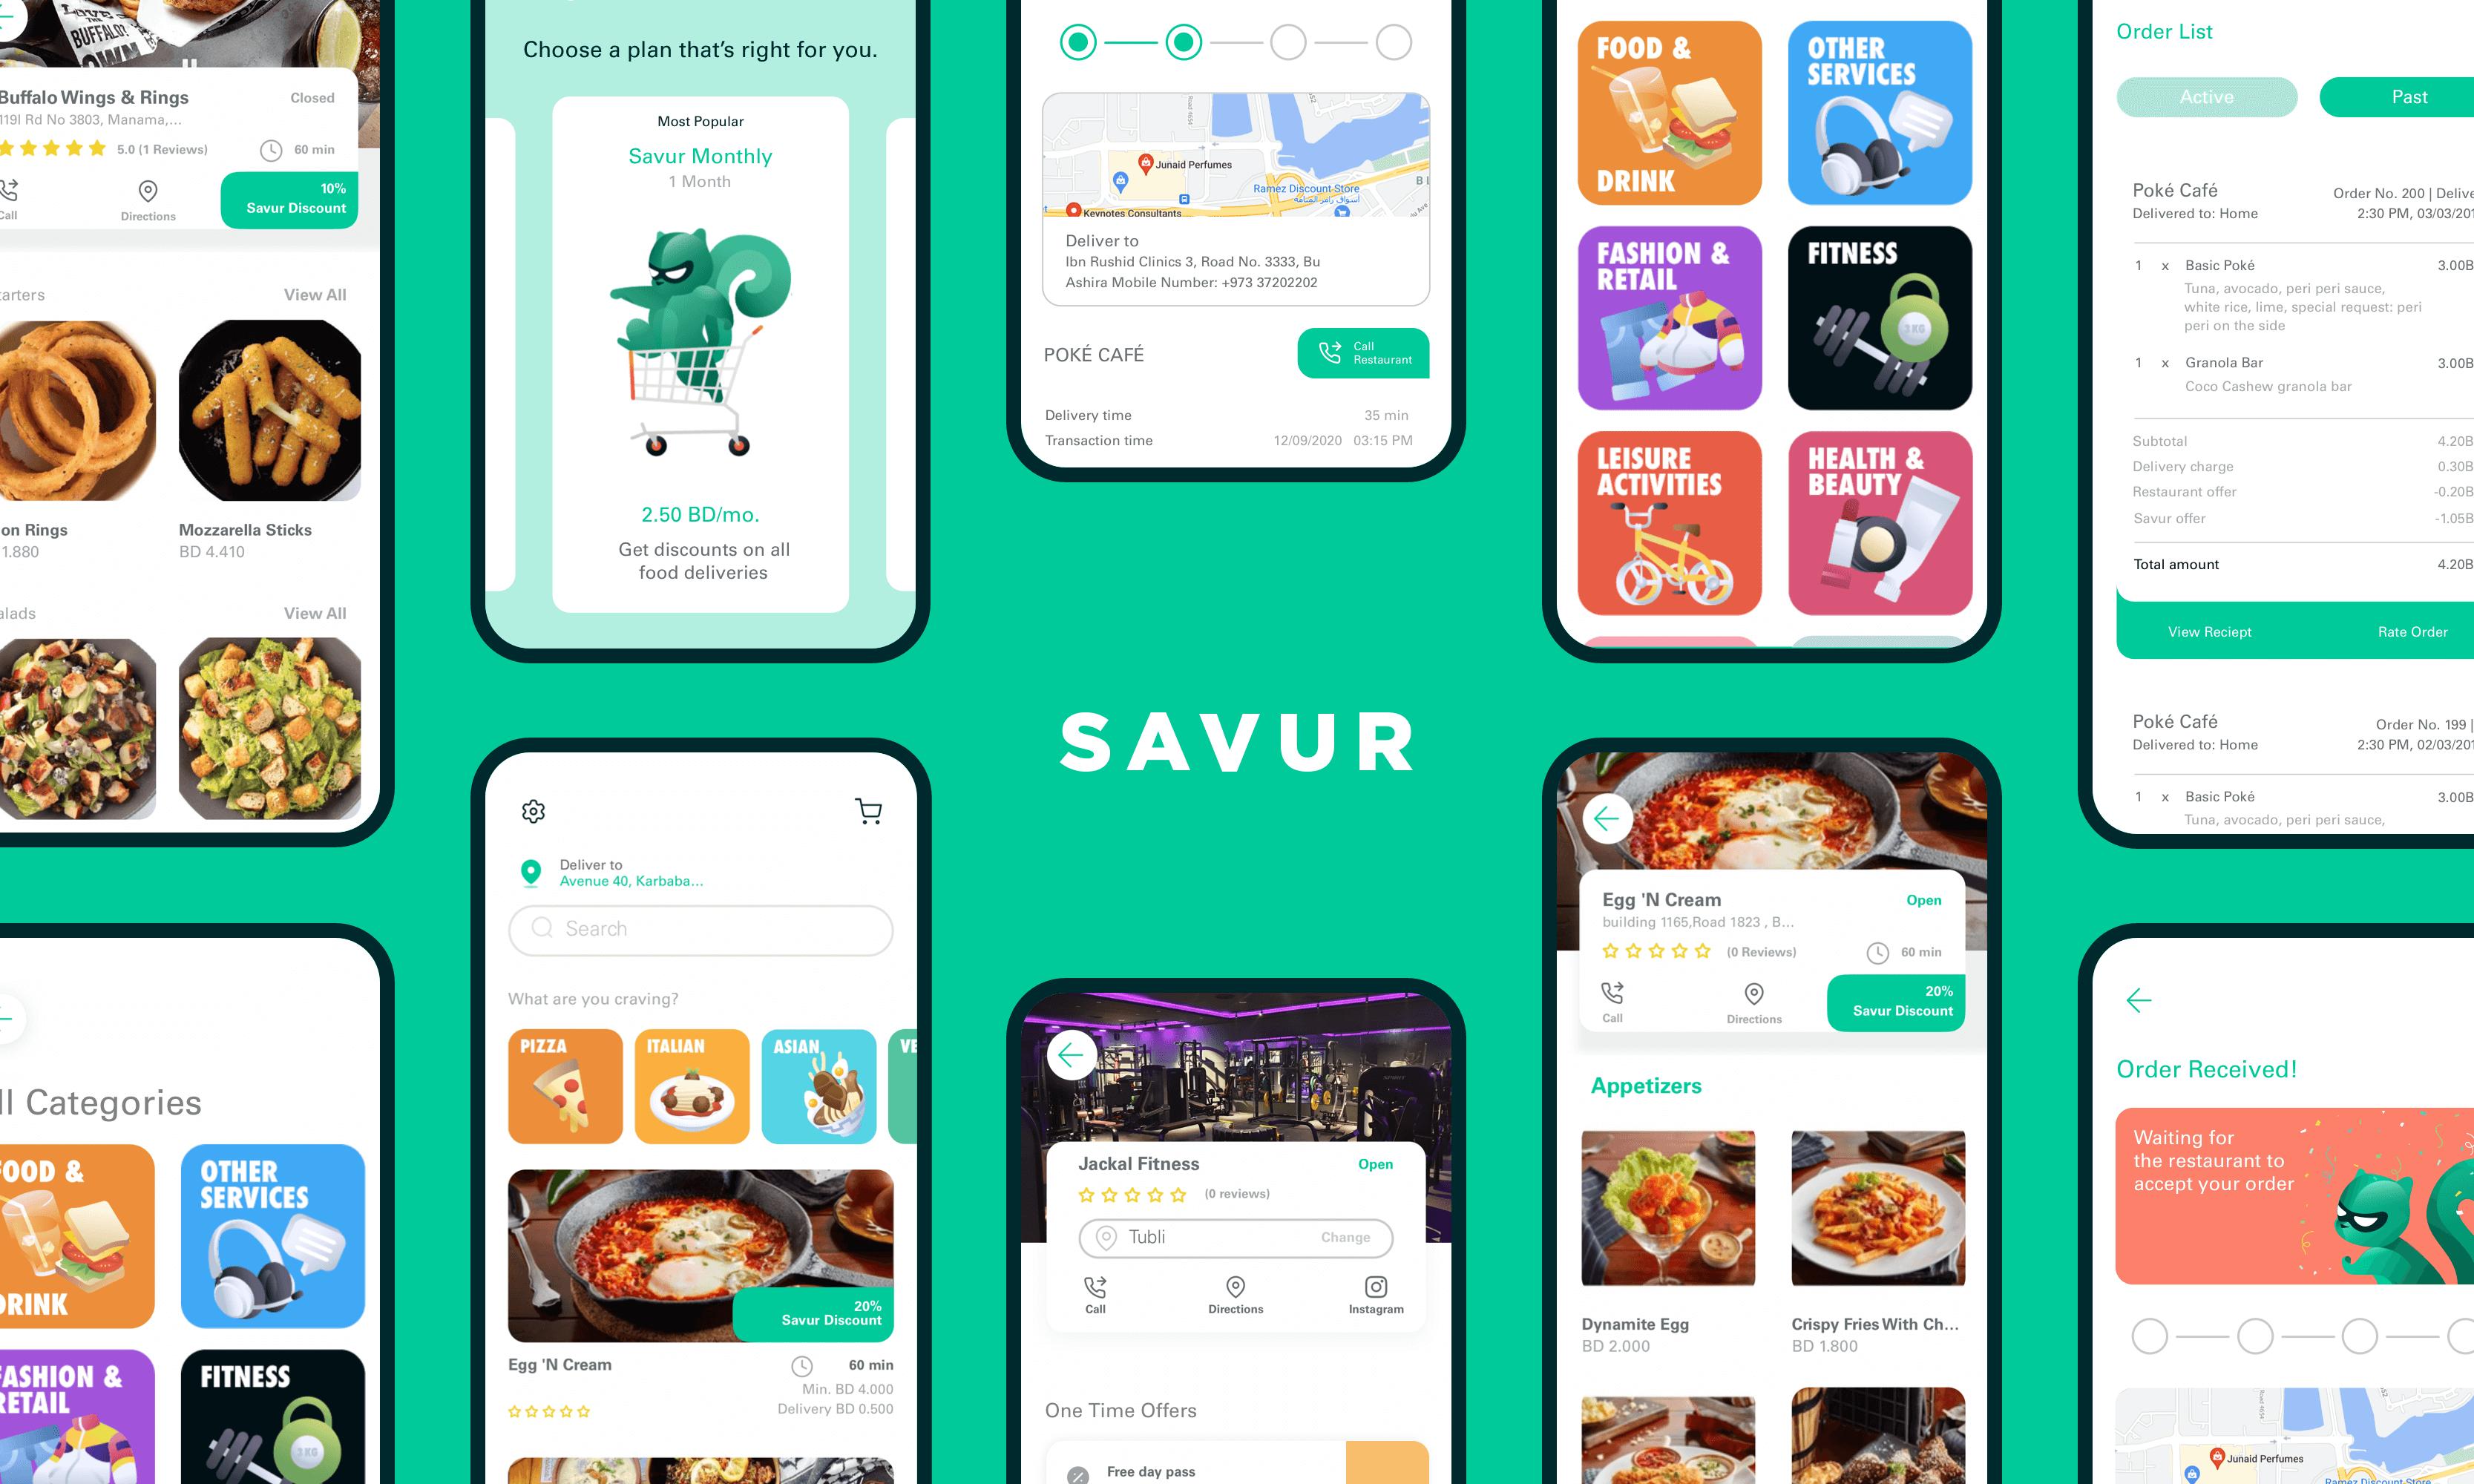 Savur_1